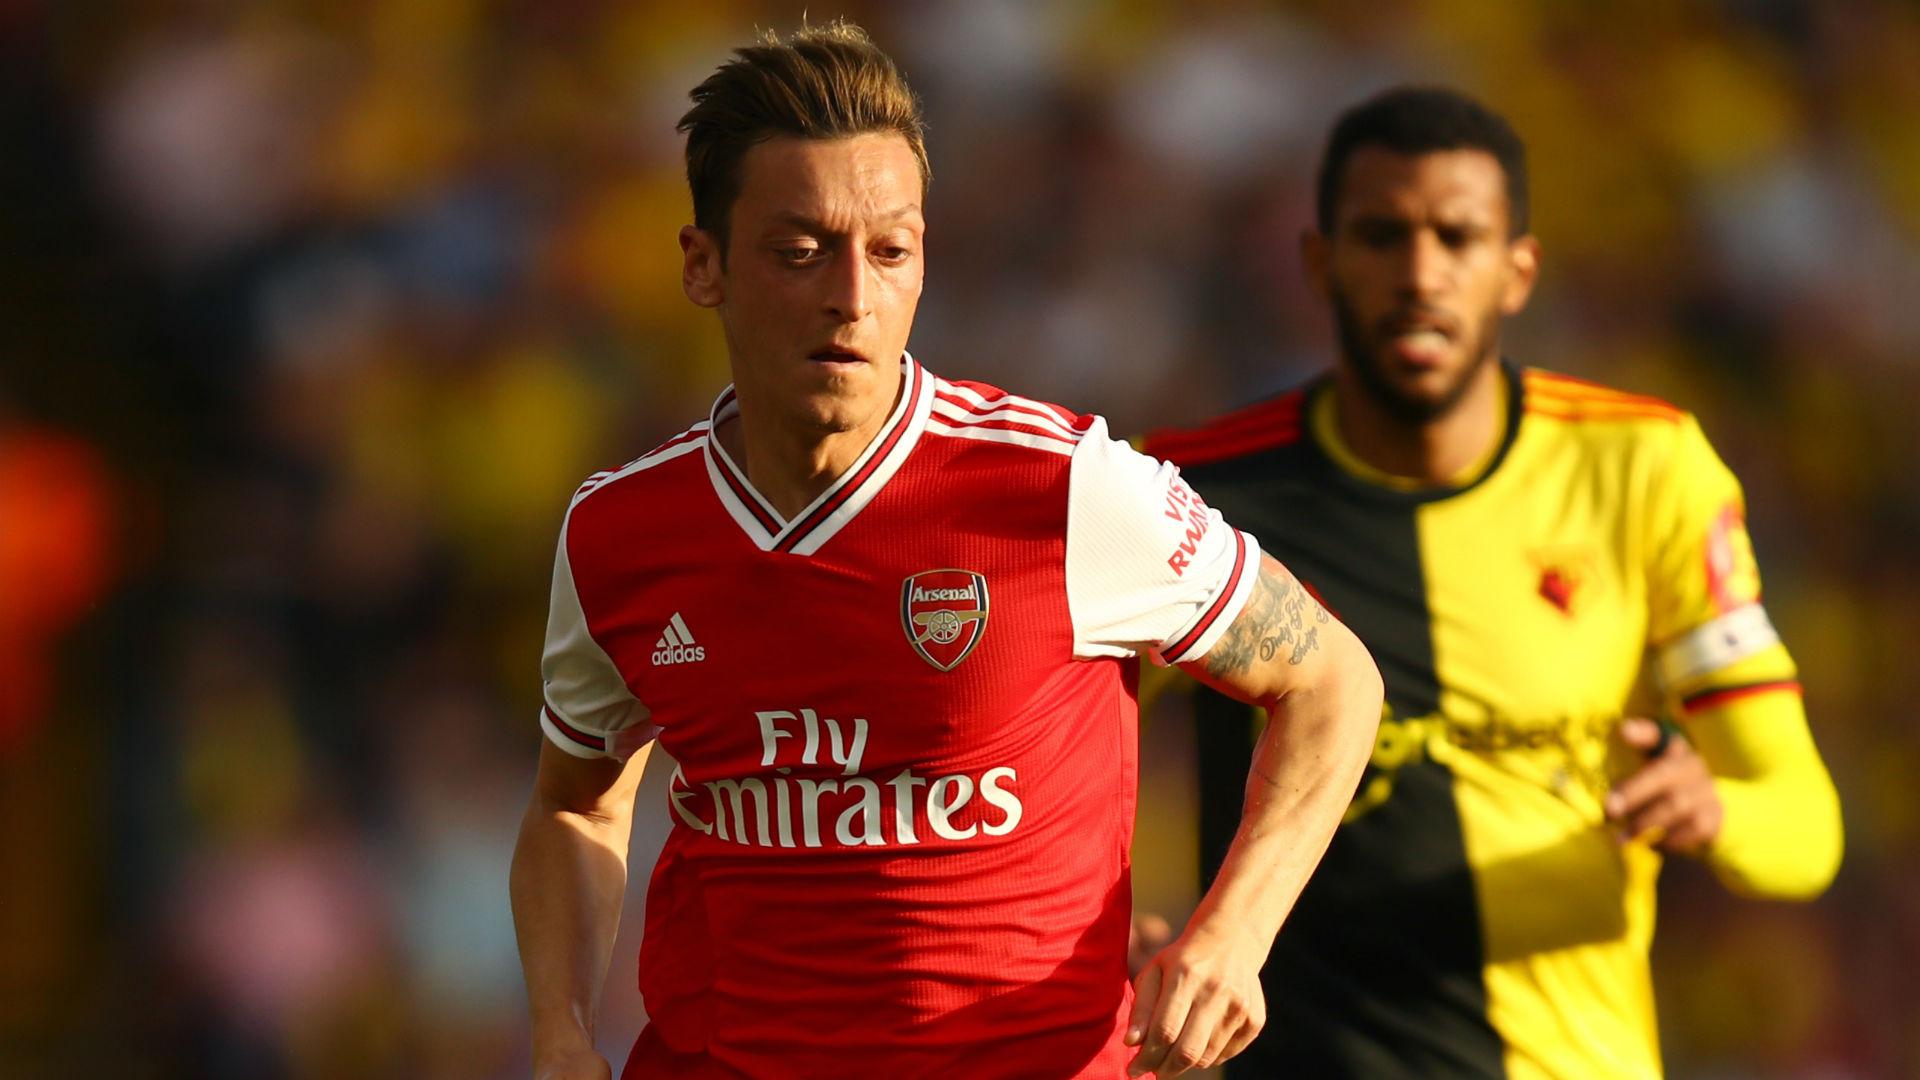 Ozil improving in training – Emery